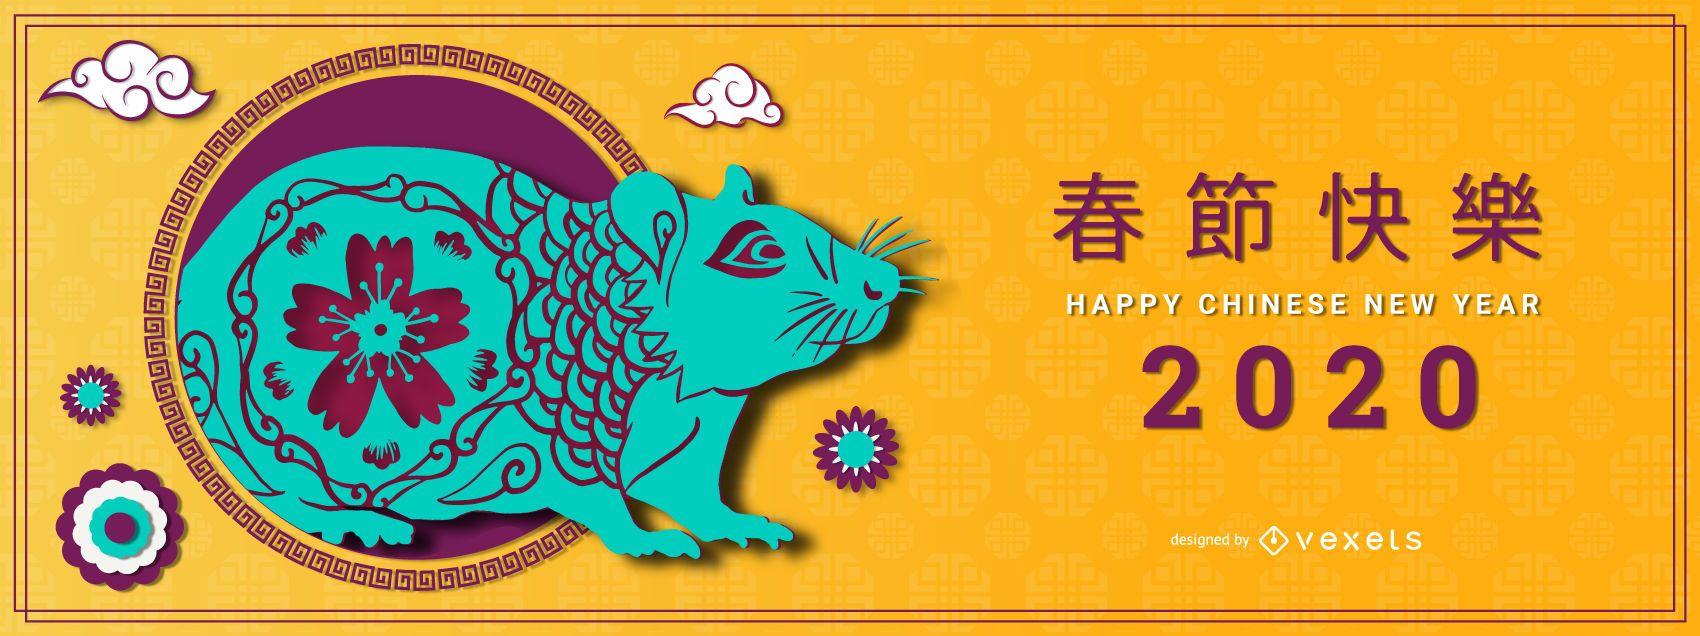 Chinese new year papercut banner